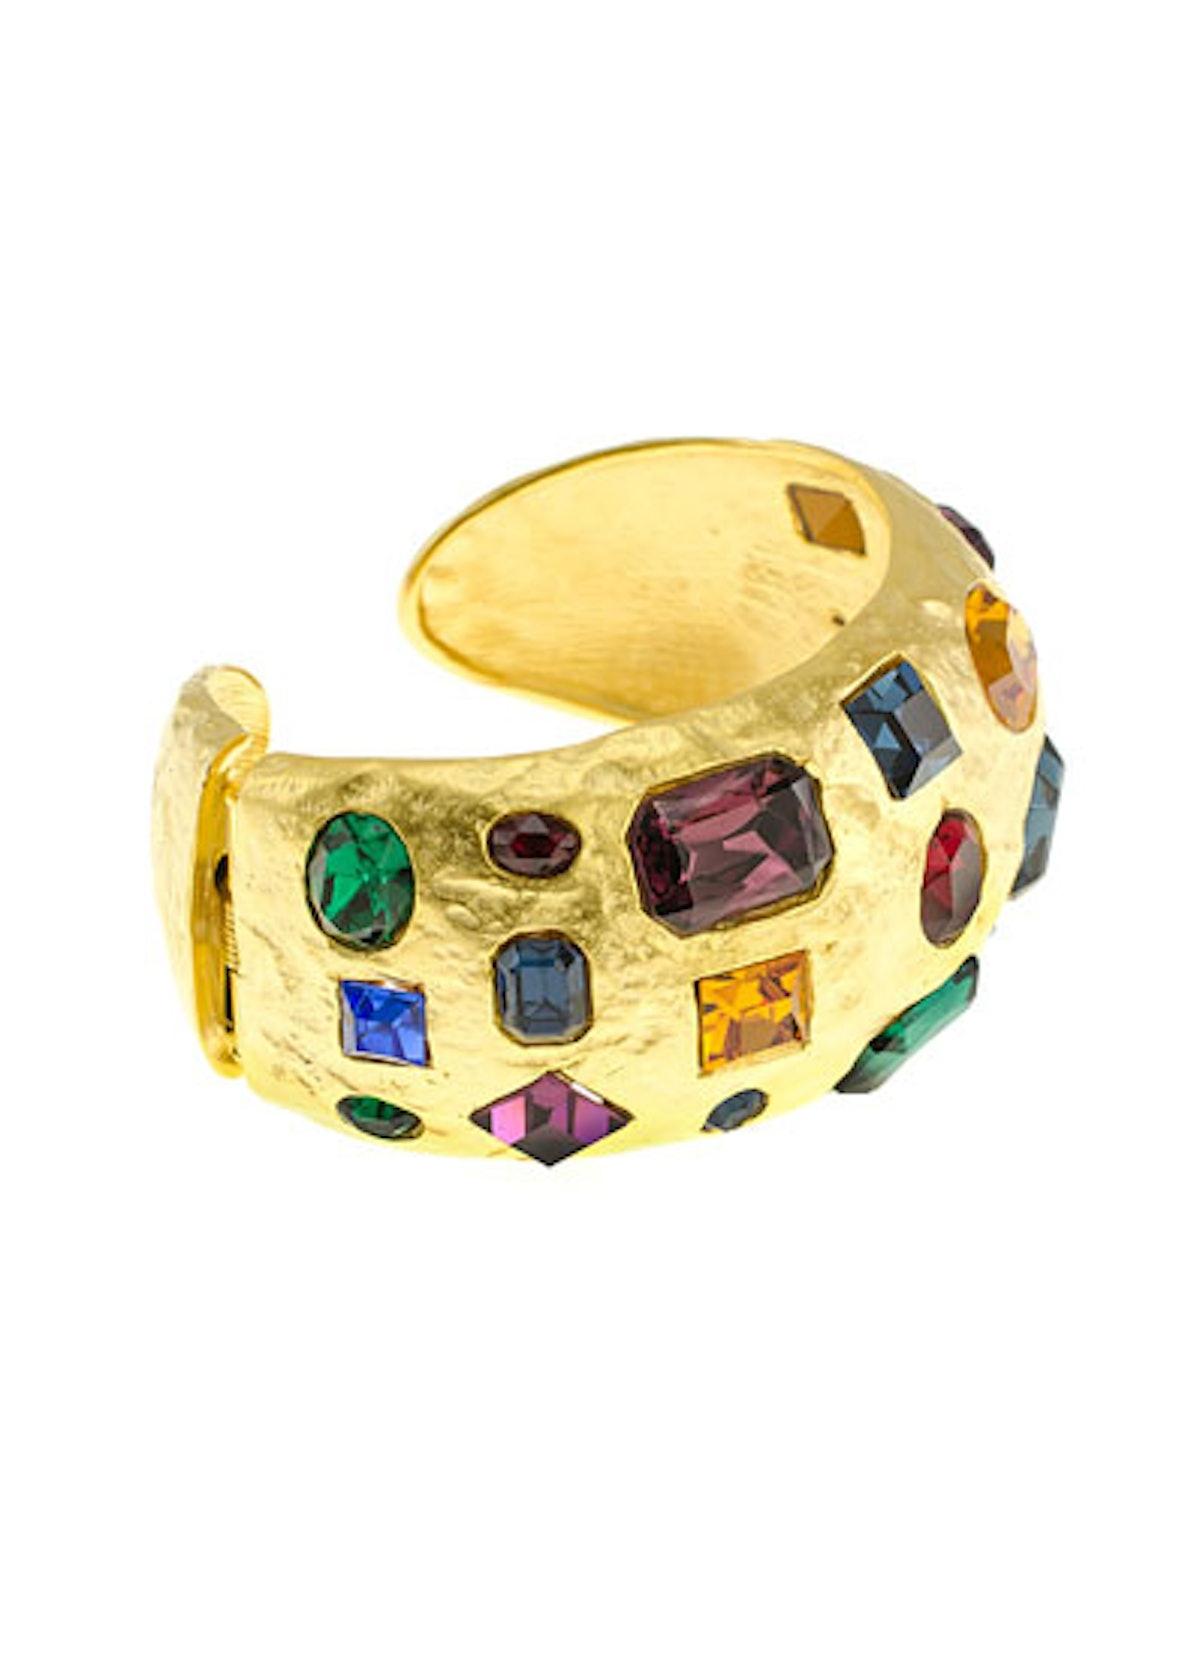 acss-decades-costume-jewelry-05-v.jpg